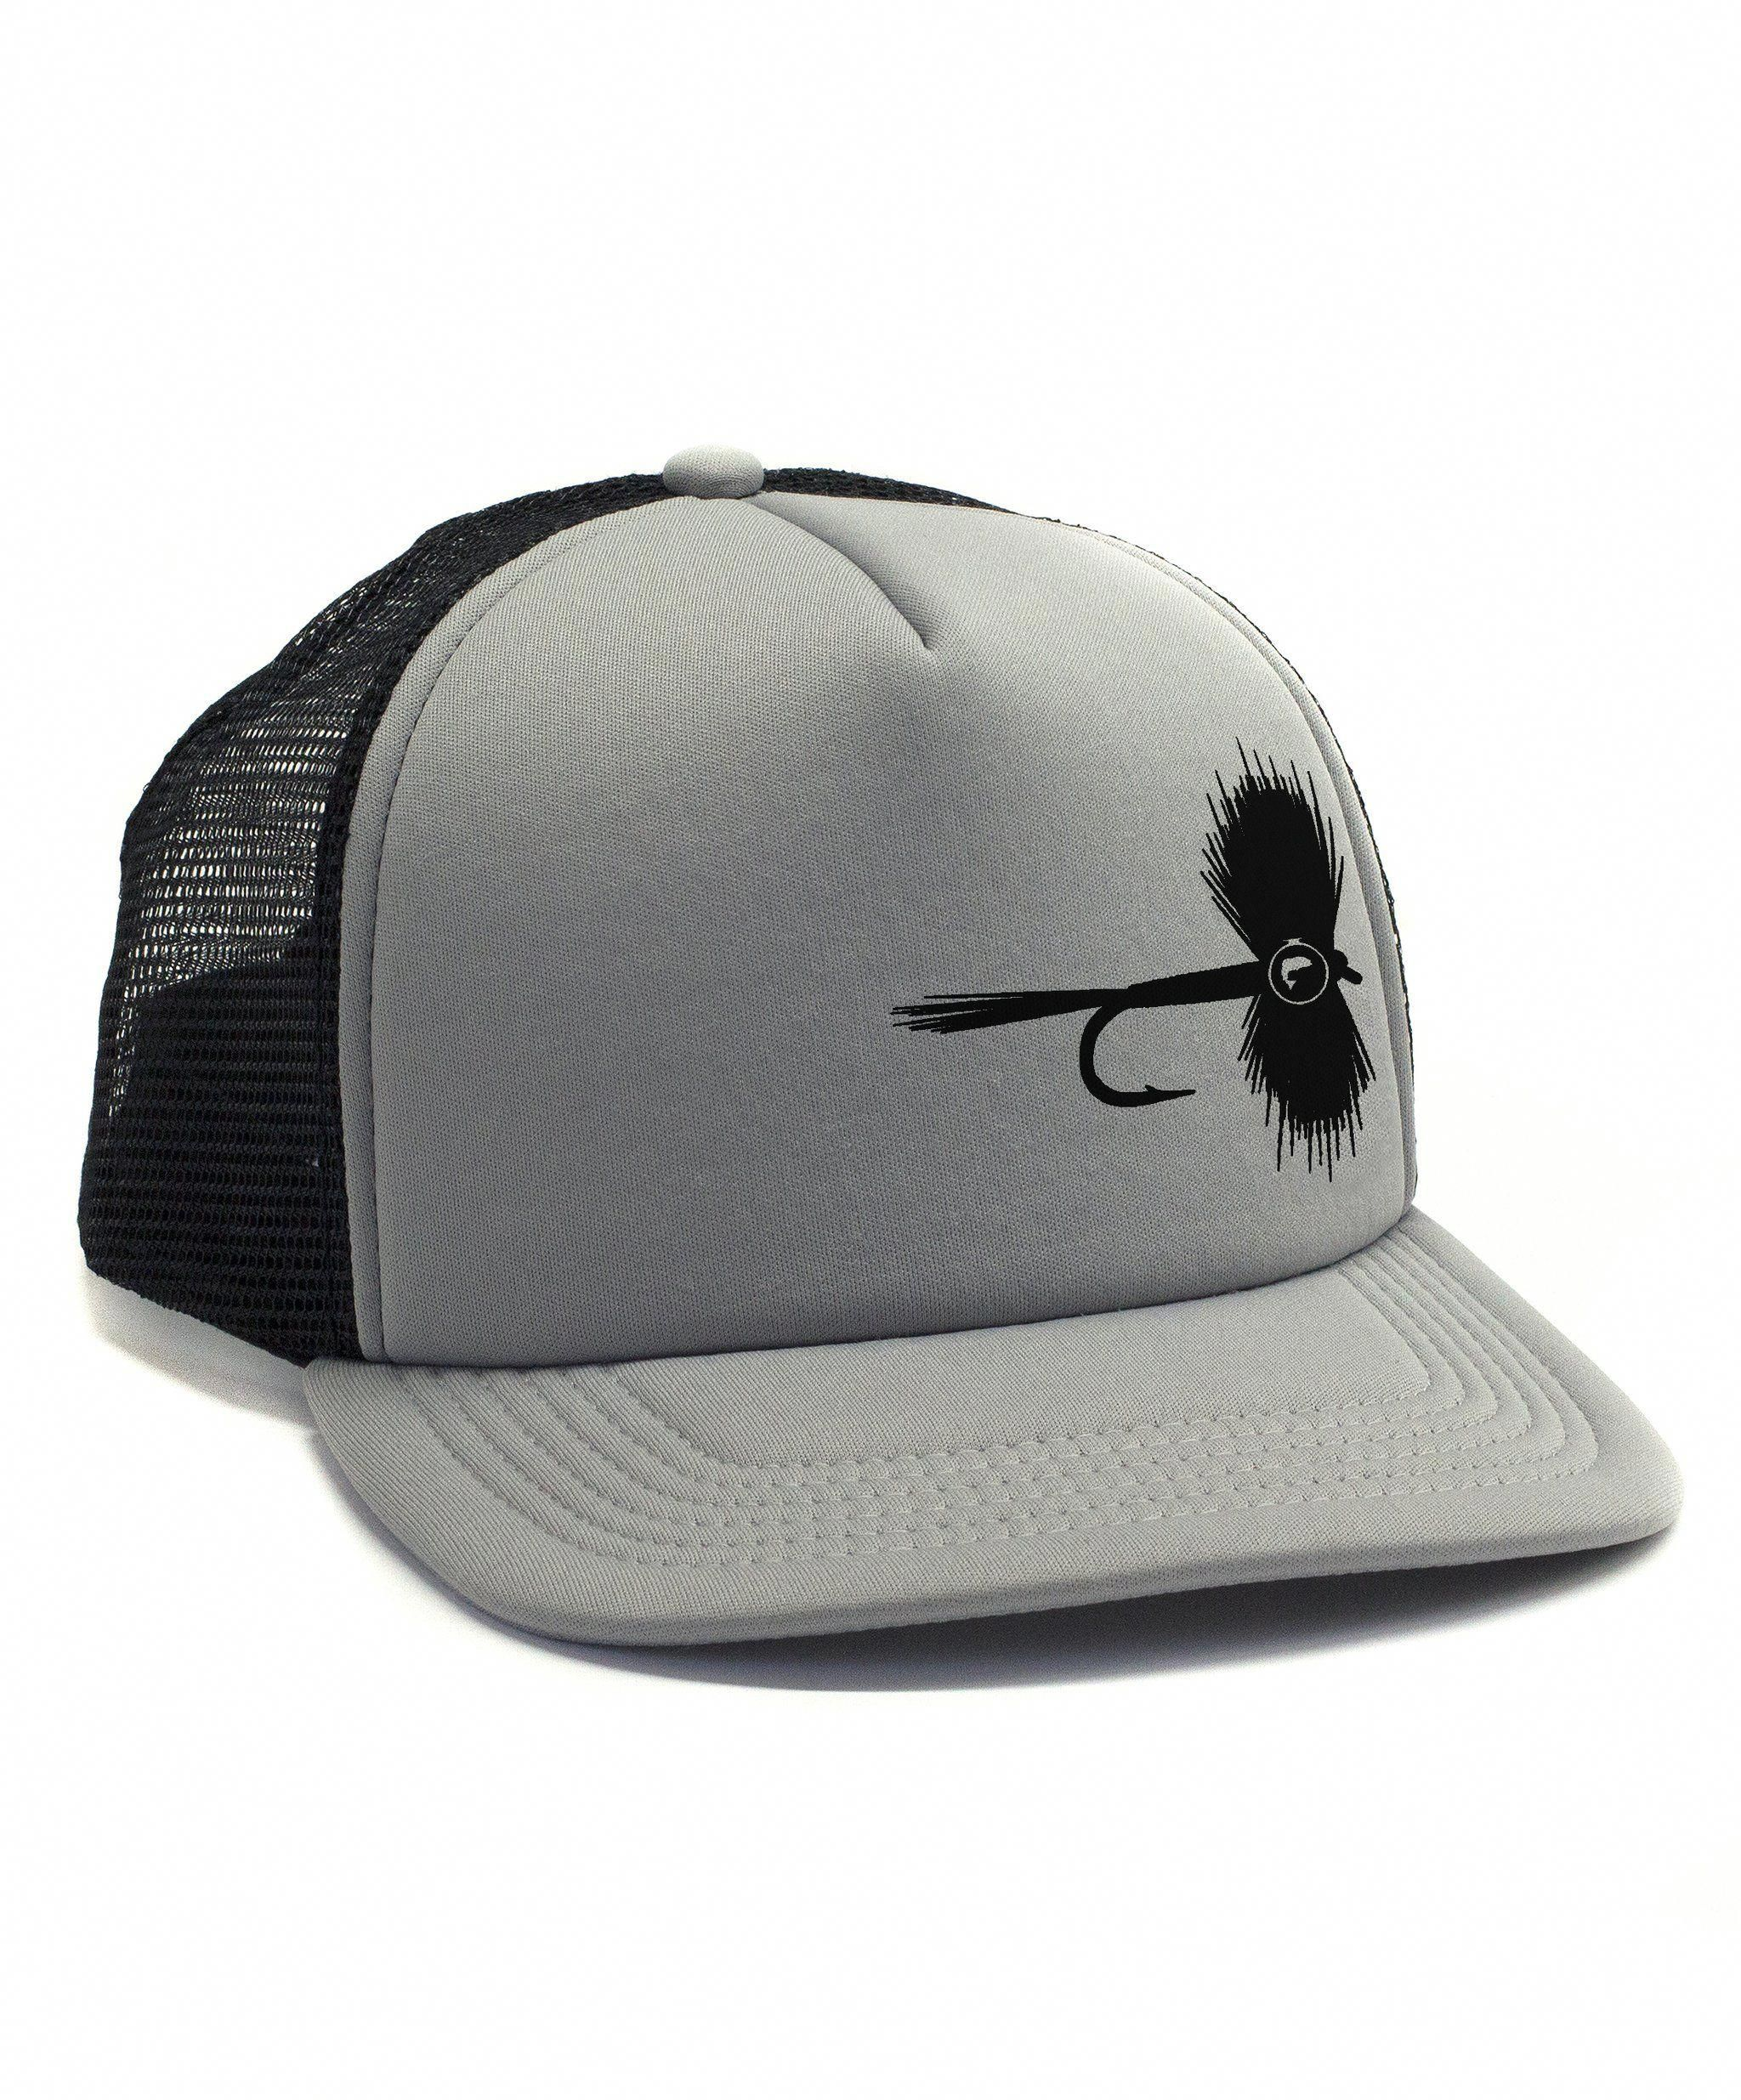 e12d9fe8c9a Fly Fishing Hats